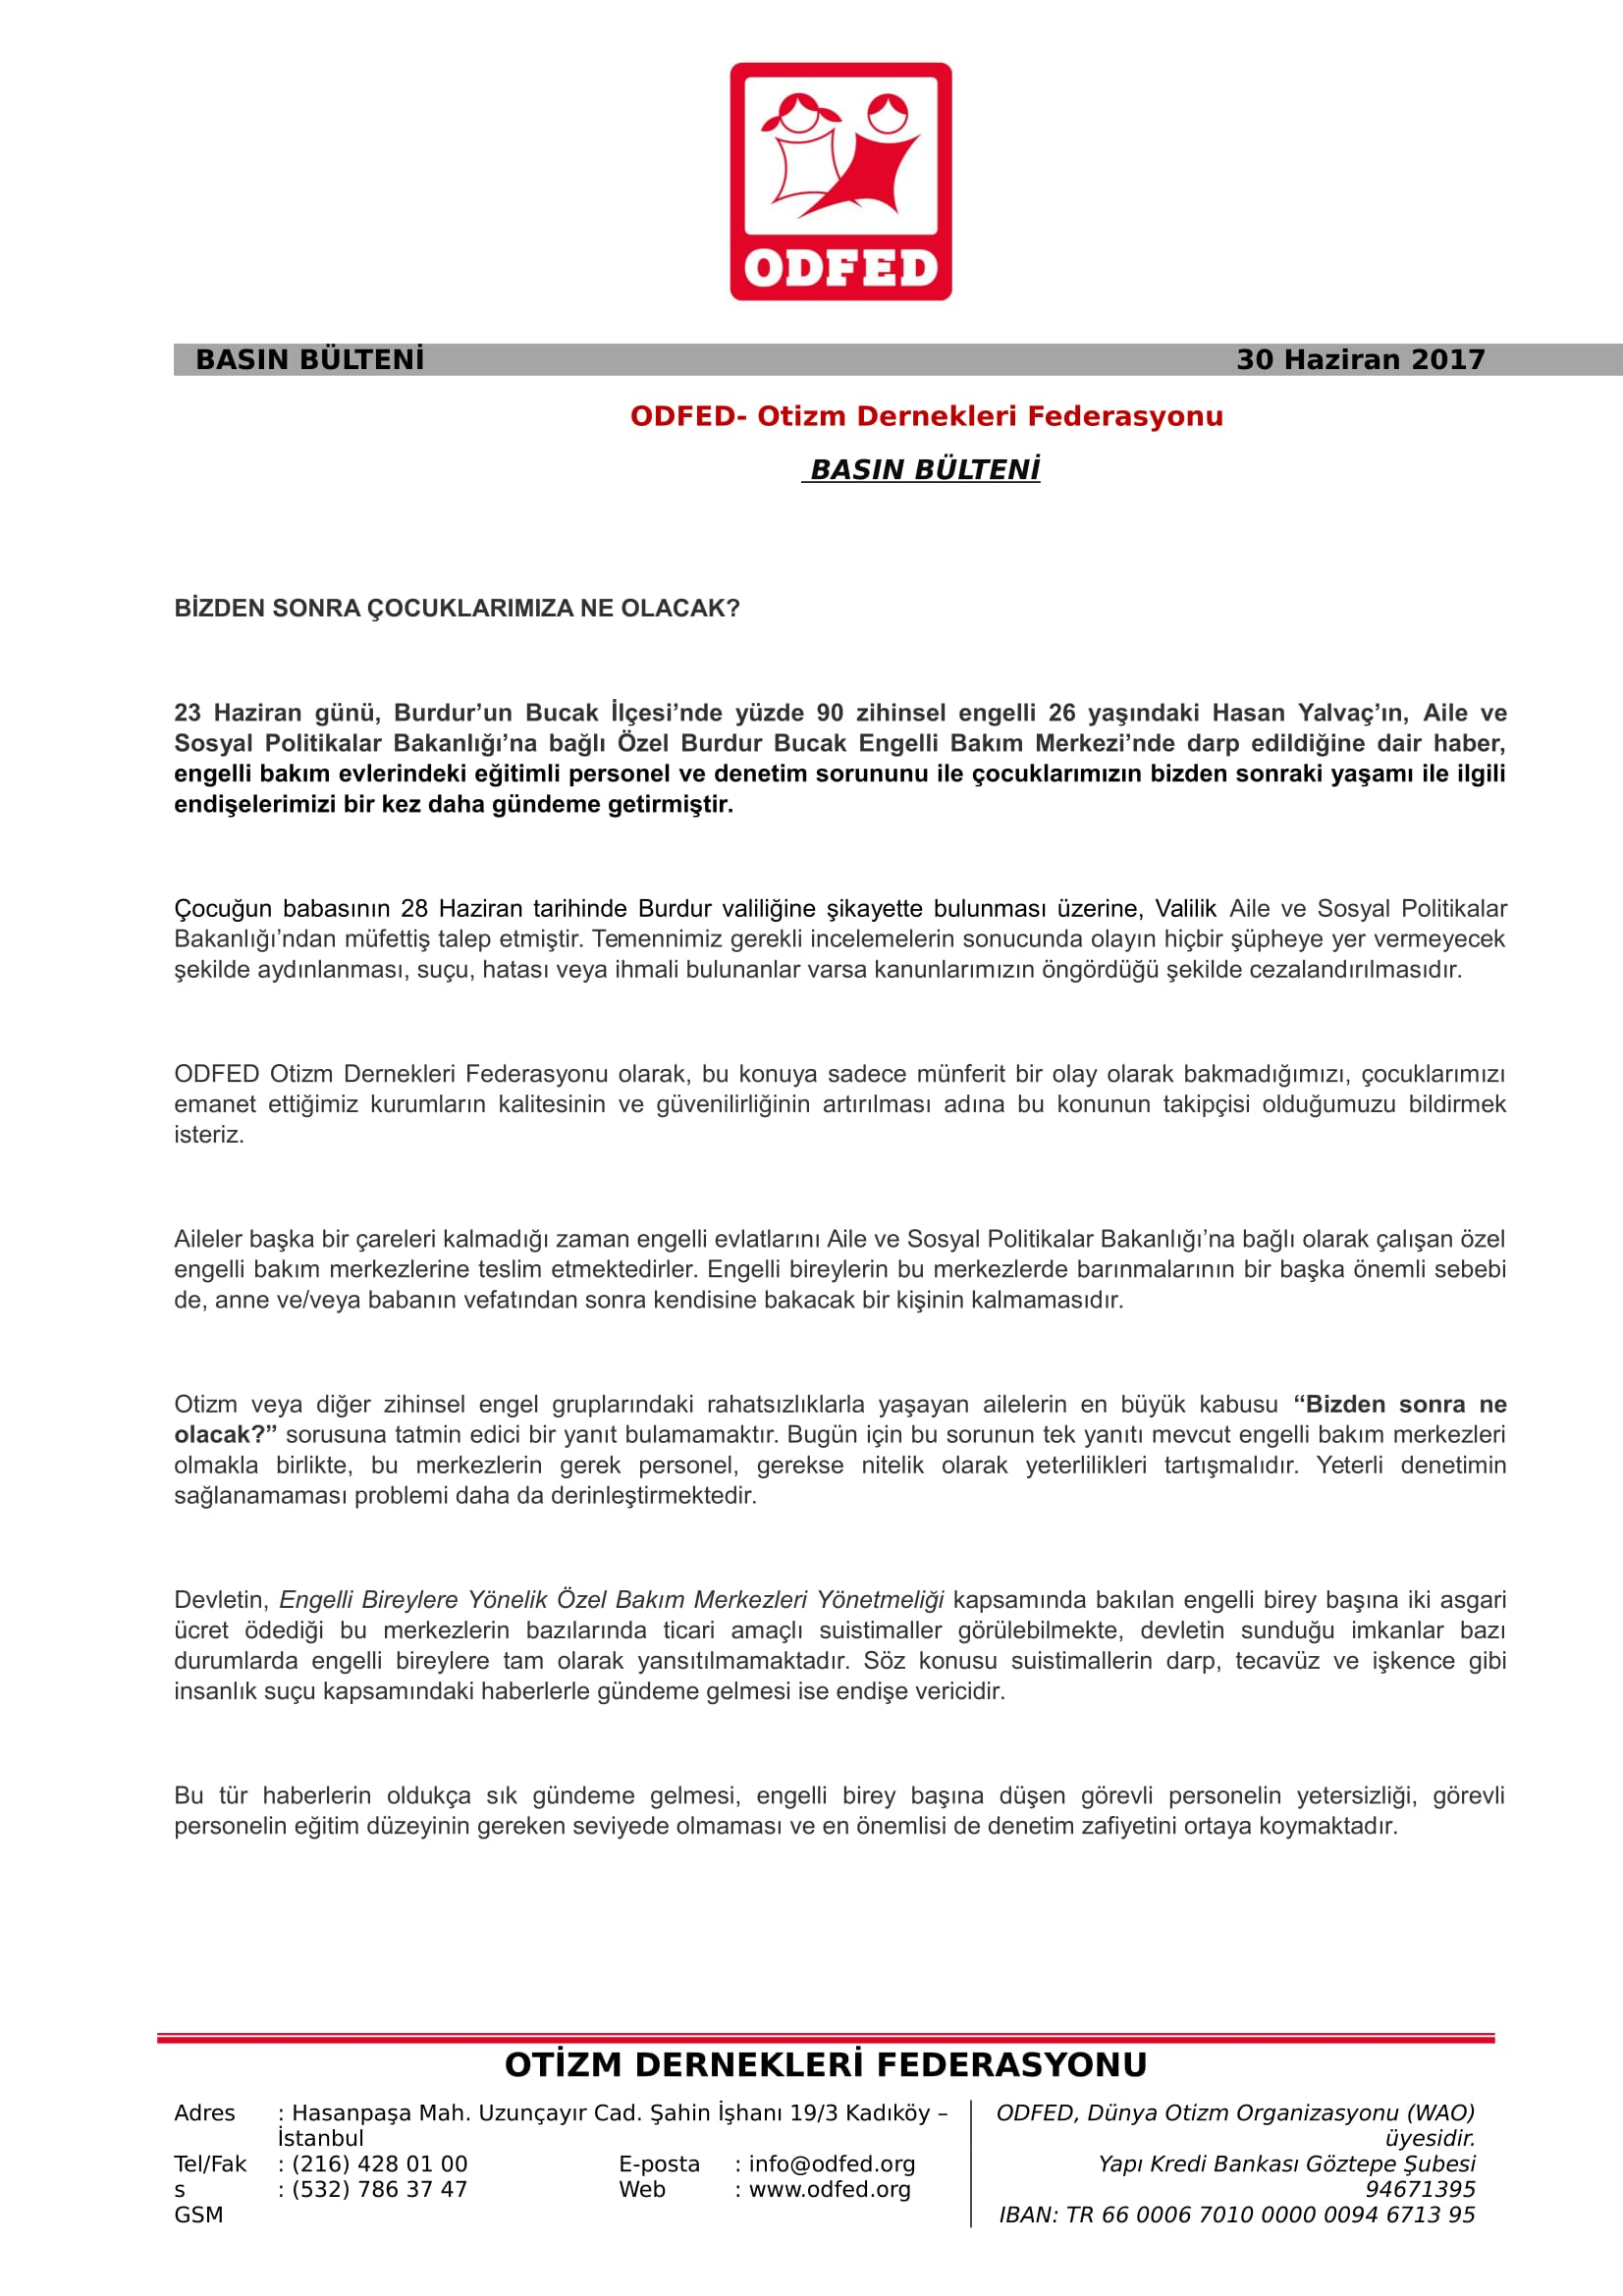 ODFED BASIN BÜLTENİ HAZİRAN 2017-1